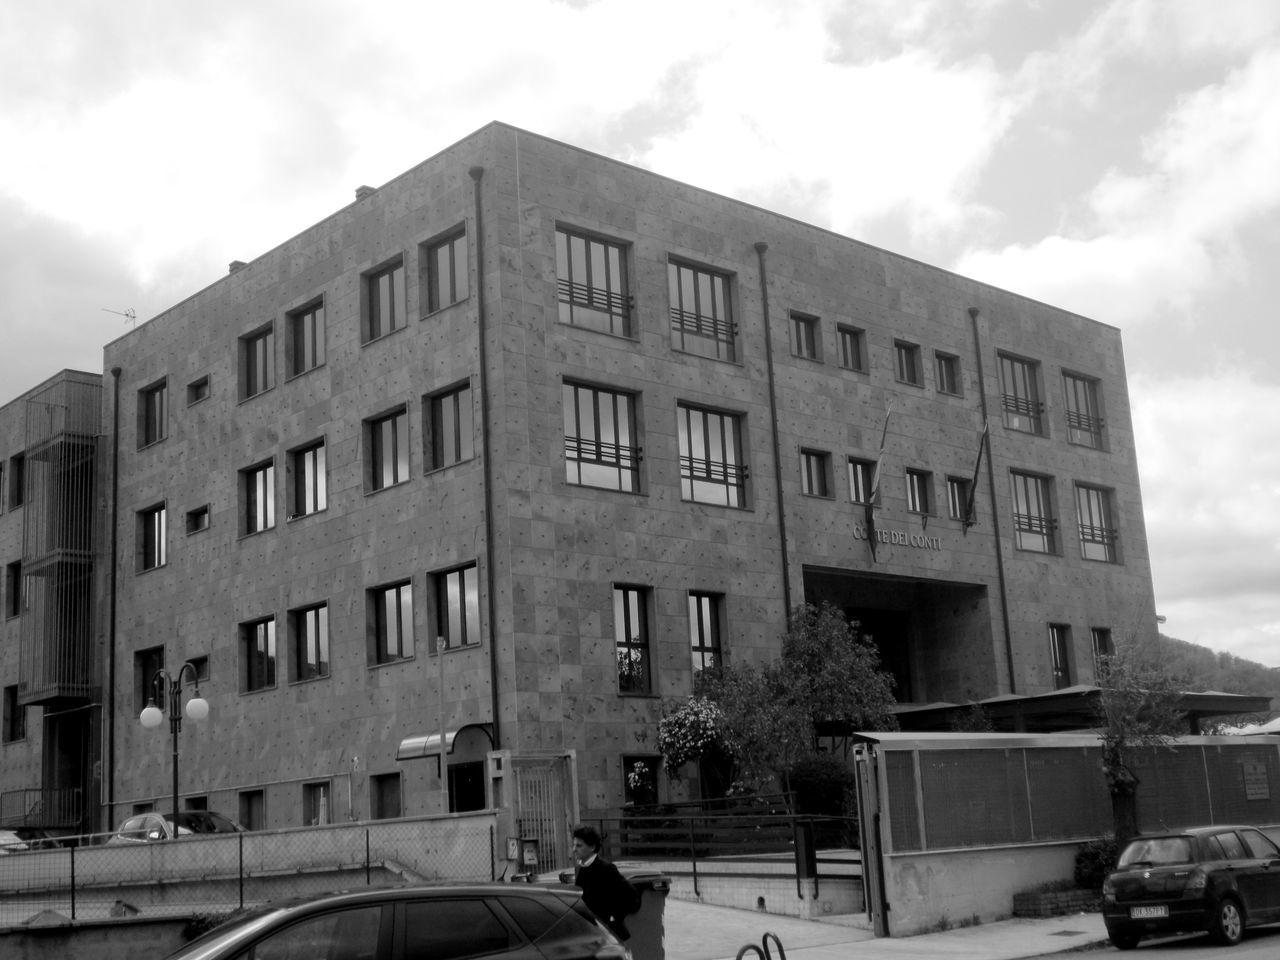 #architecture #basilicata #binari #Black&White #blackandwhite #fotobiancoenero #fotobianconero #bianco&nero #potenza #potenzainferiore #urbanphotography #vialedelbasento